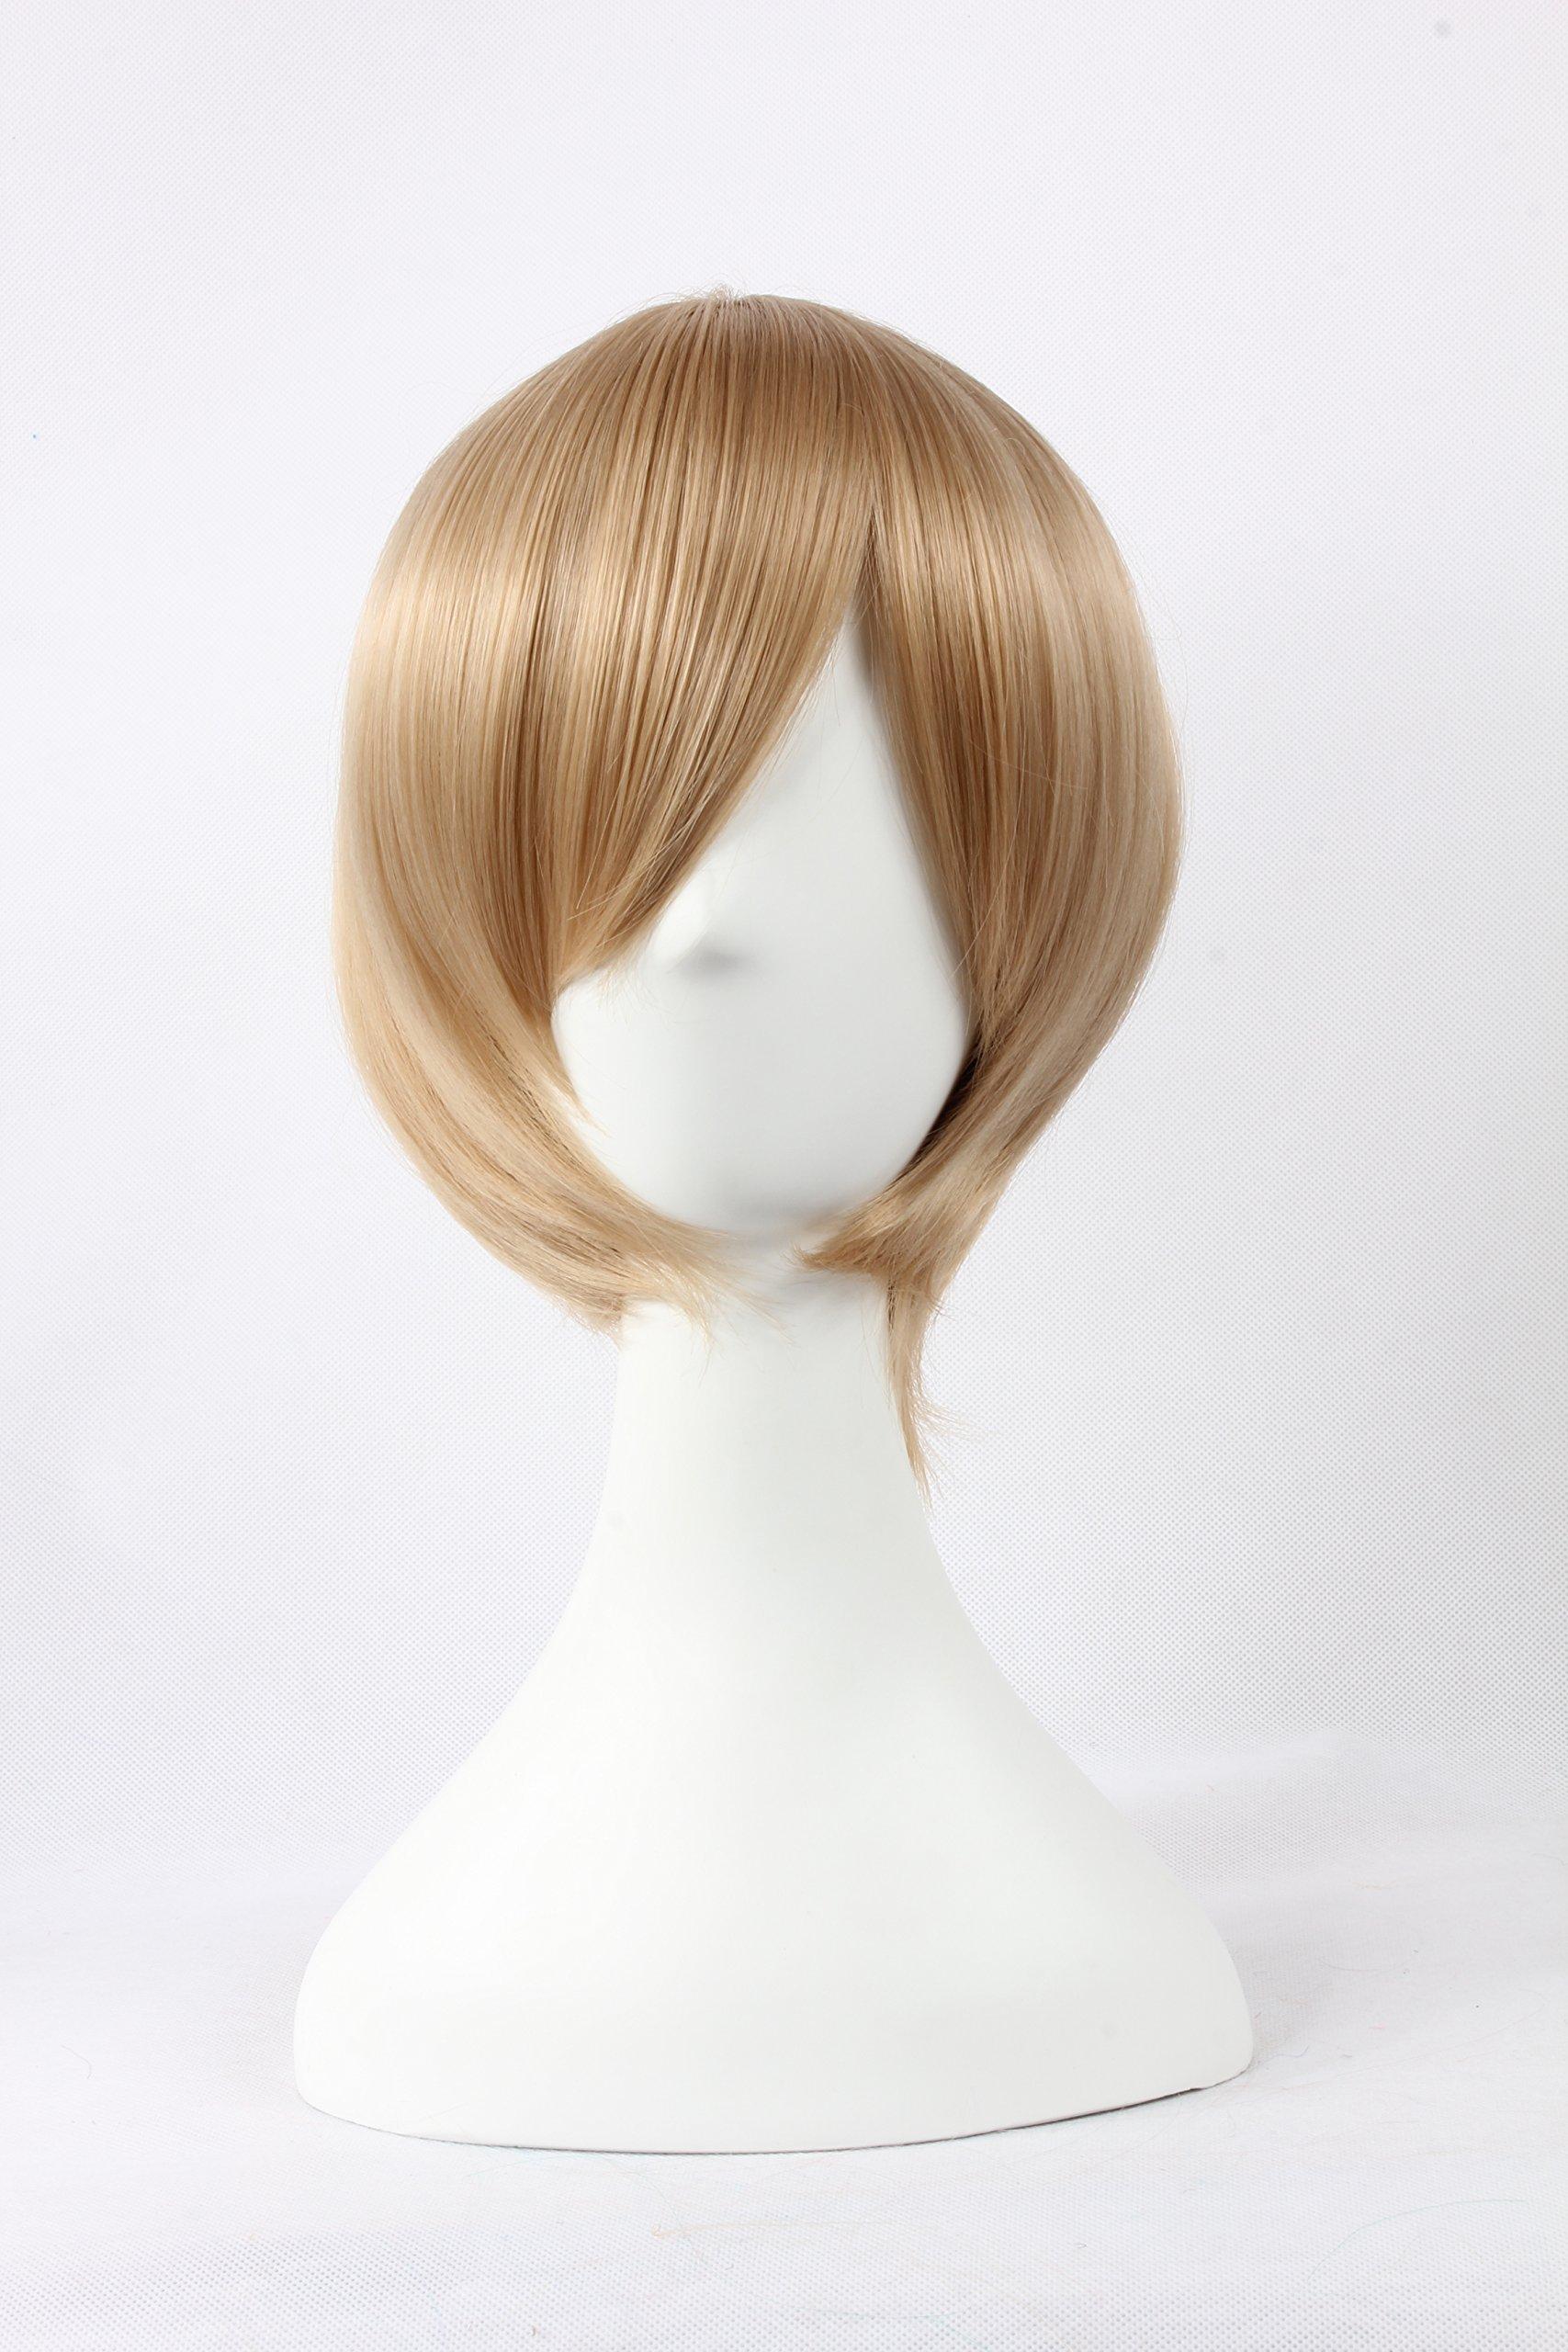 Coolsky Wigs Shugo Chara£¬Natsume Yuujinchou £¬Light Katekyo Hitman Reborn Light Flaxen Hair Cosplay